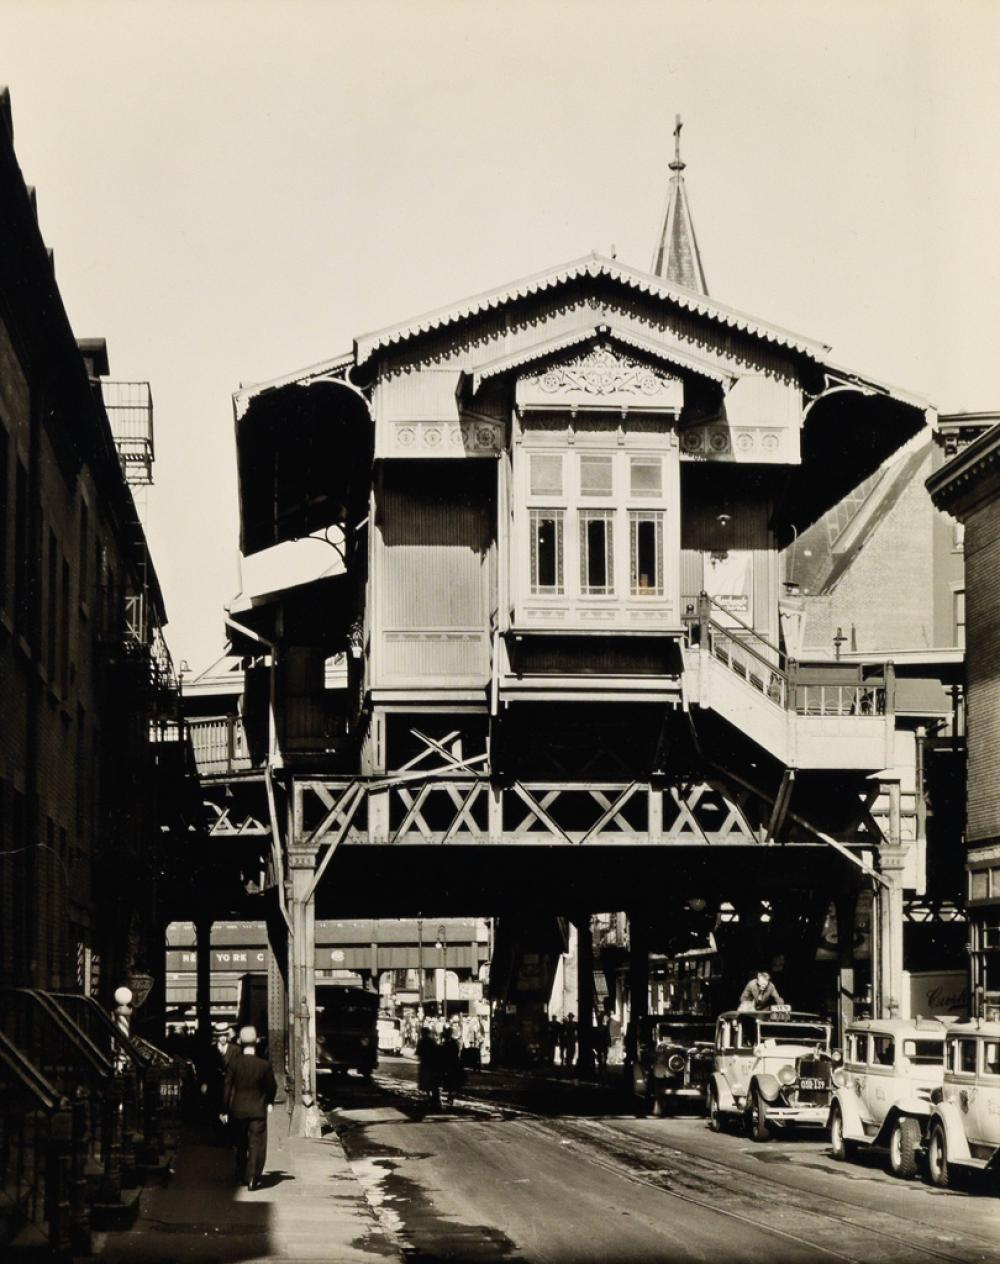 BERENICE ABBOTT (1898-1991) El Station, Ninth Avenue Line.